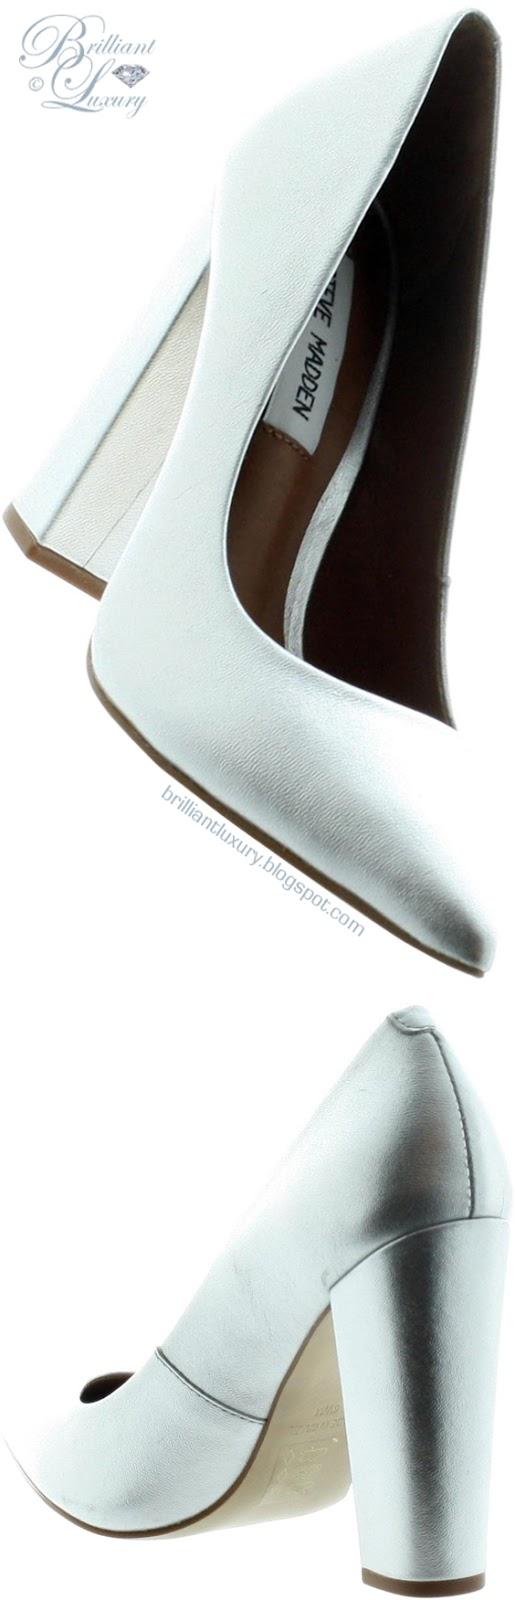 Brilliant Luxury ♦ Steve Madden Primpy blue block-heel pumps